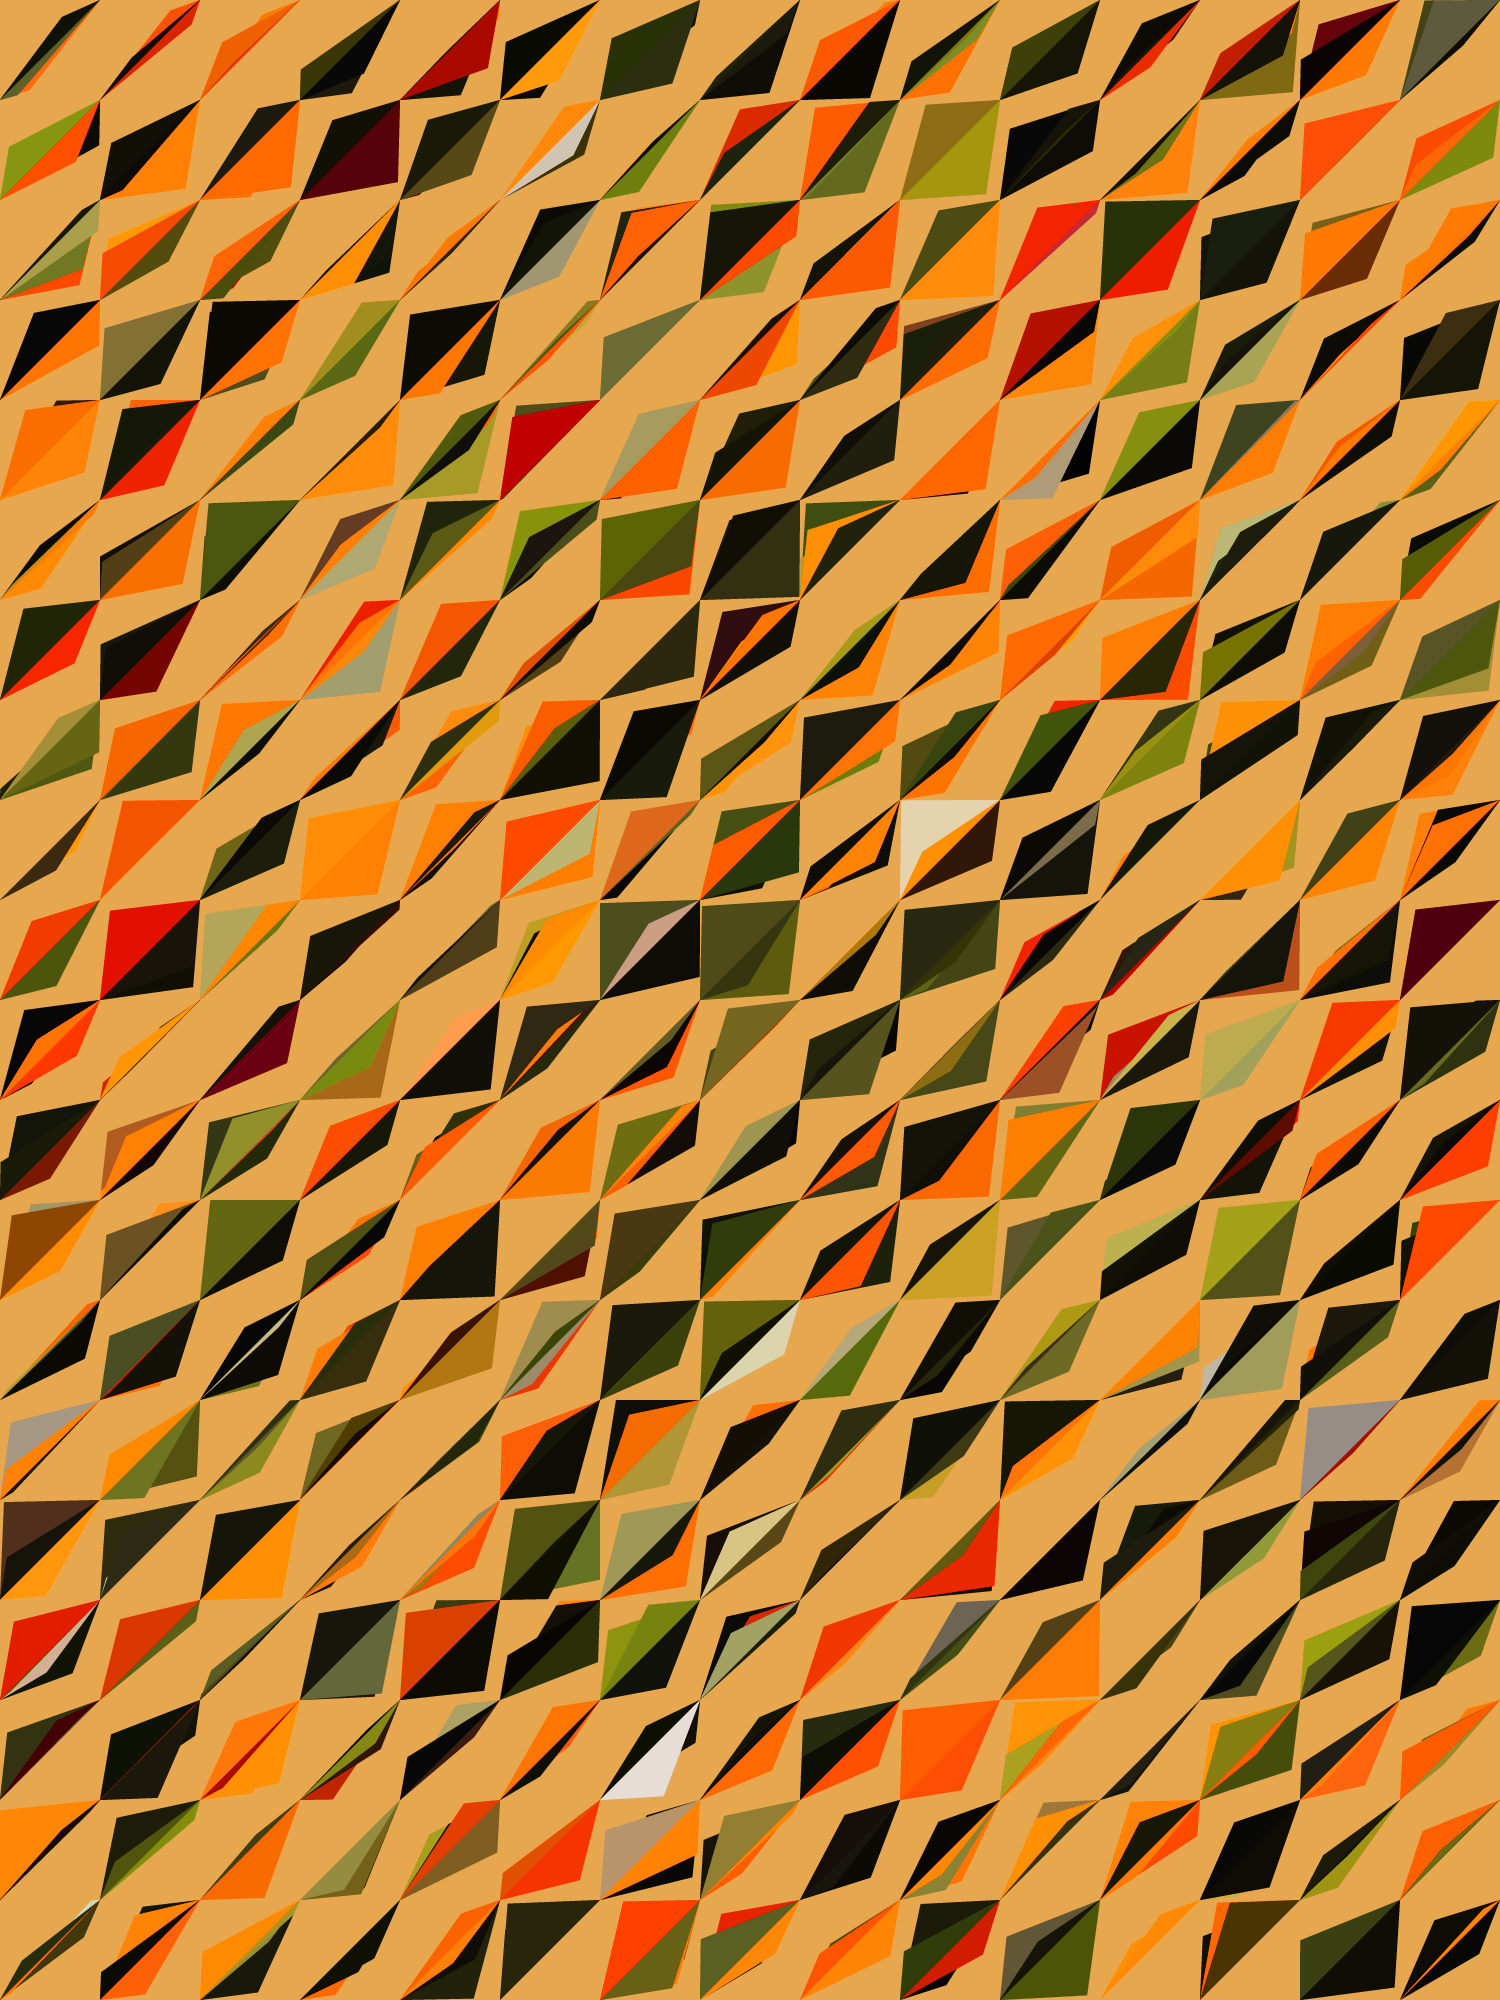 DiagonalPattern_2_CalDean.png